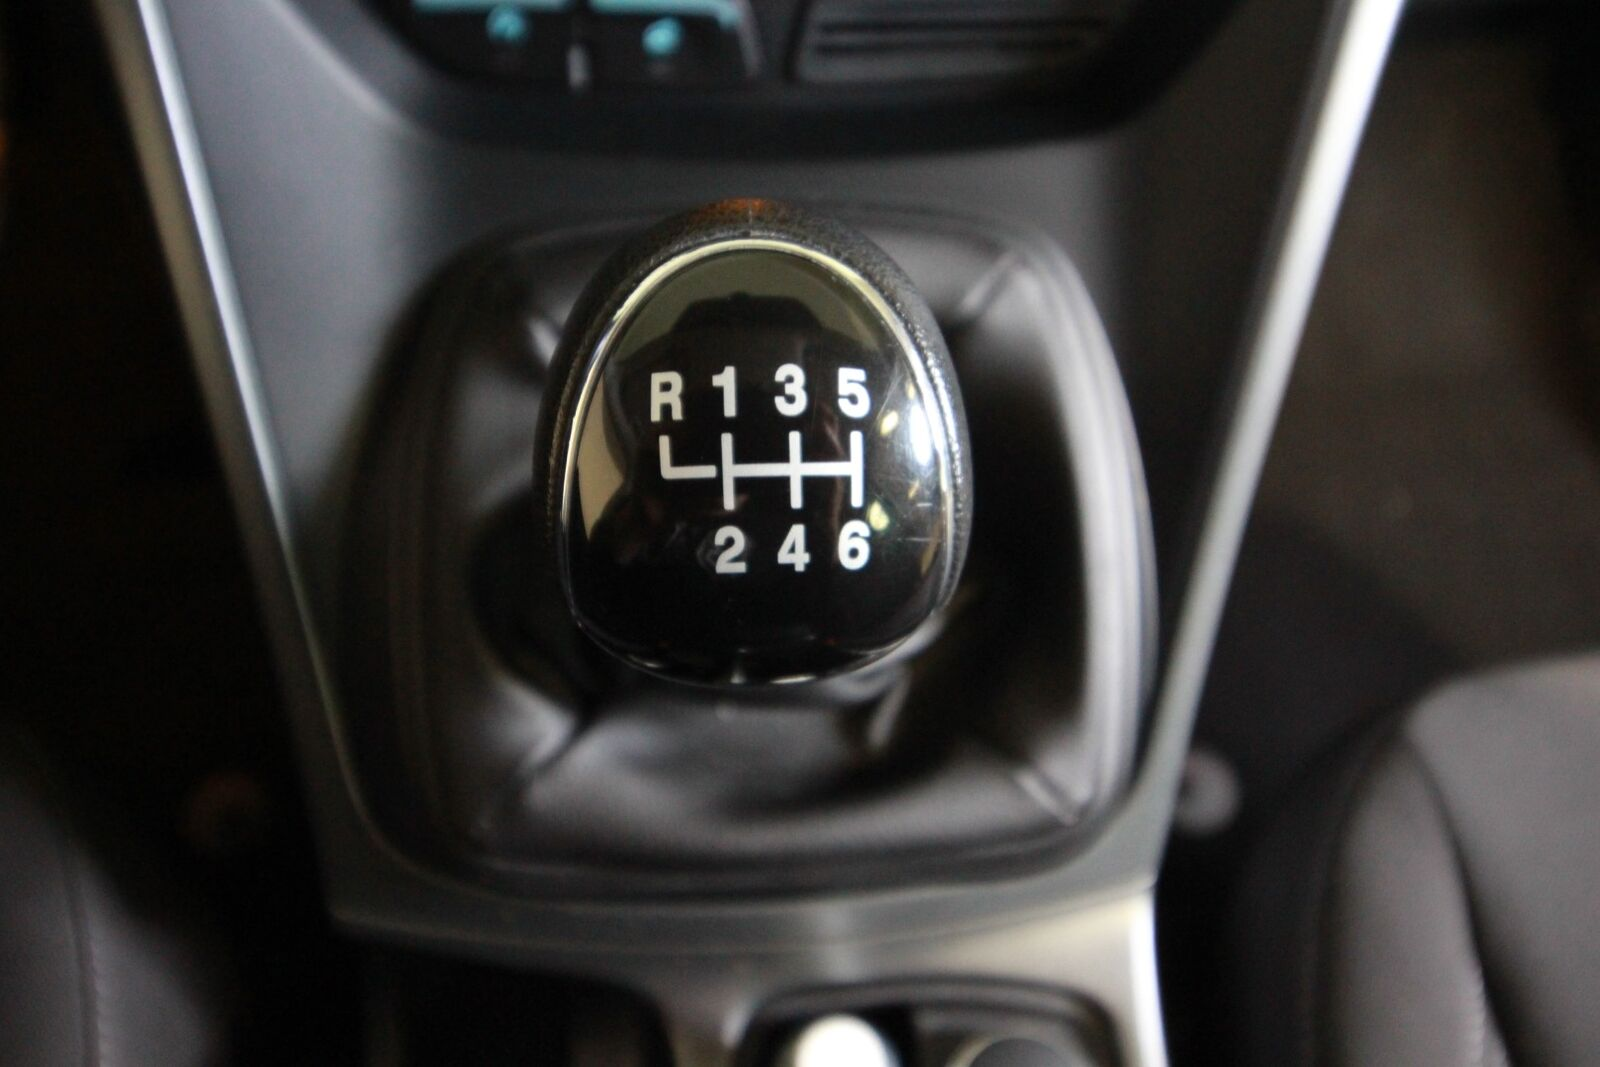 Ford Kuga TDCi 120 Trend+